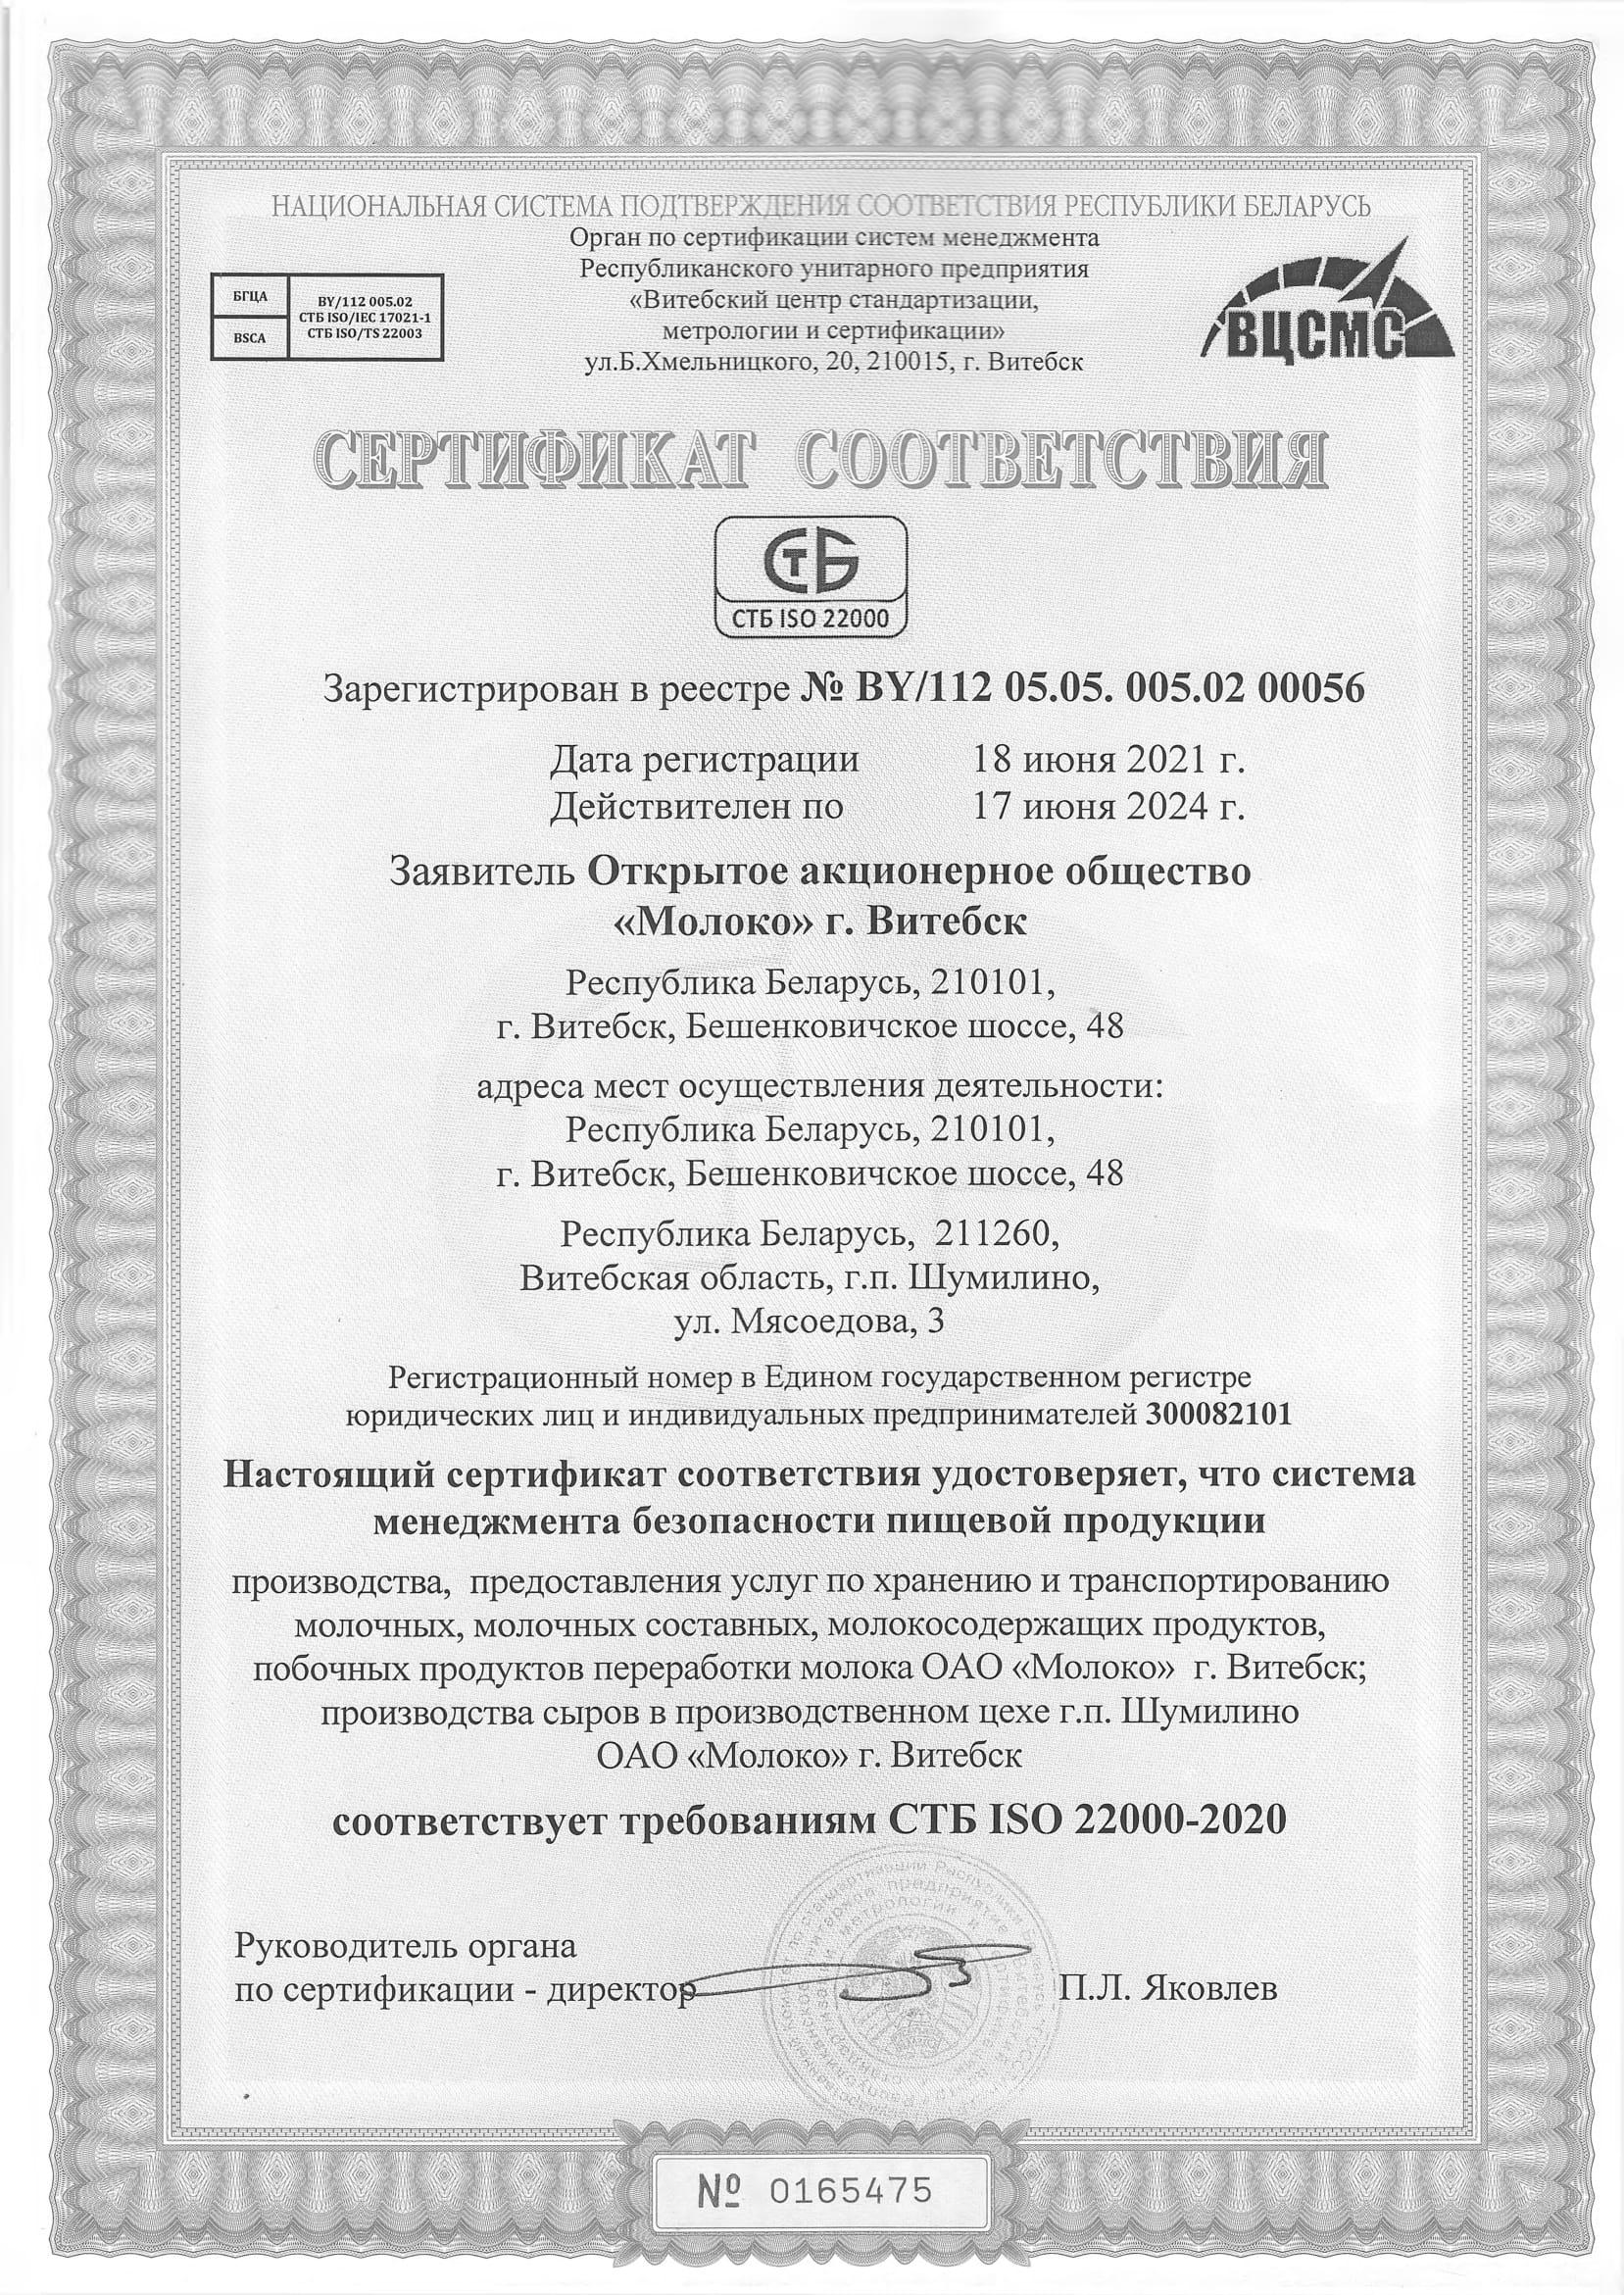 Certificate of conformity STB ISO 22000-2020 (Vitebsk, Shumilino)